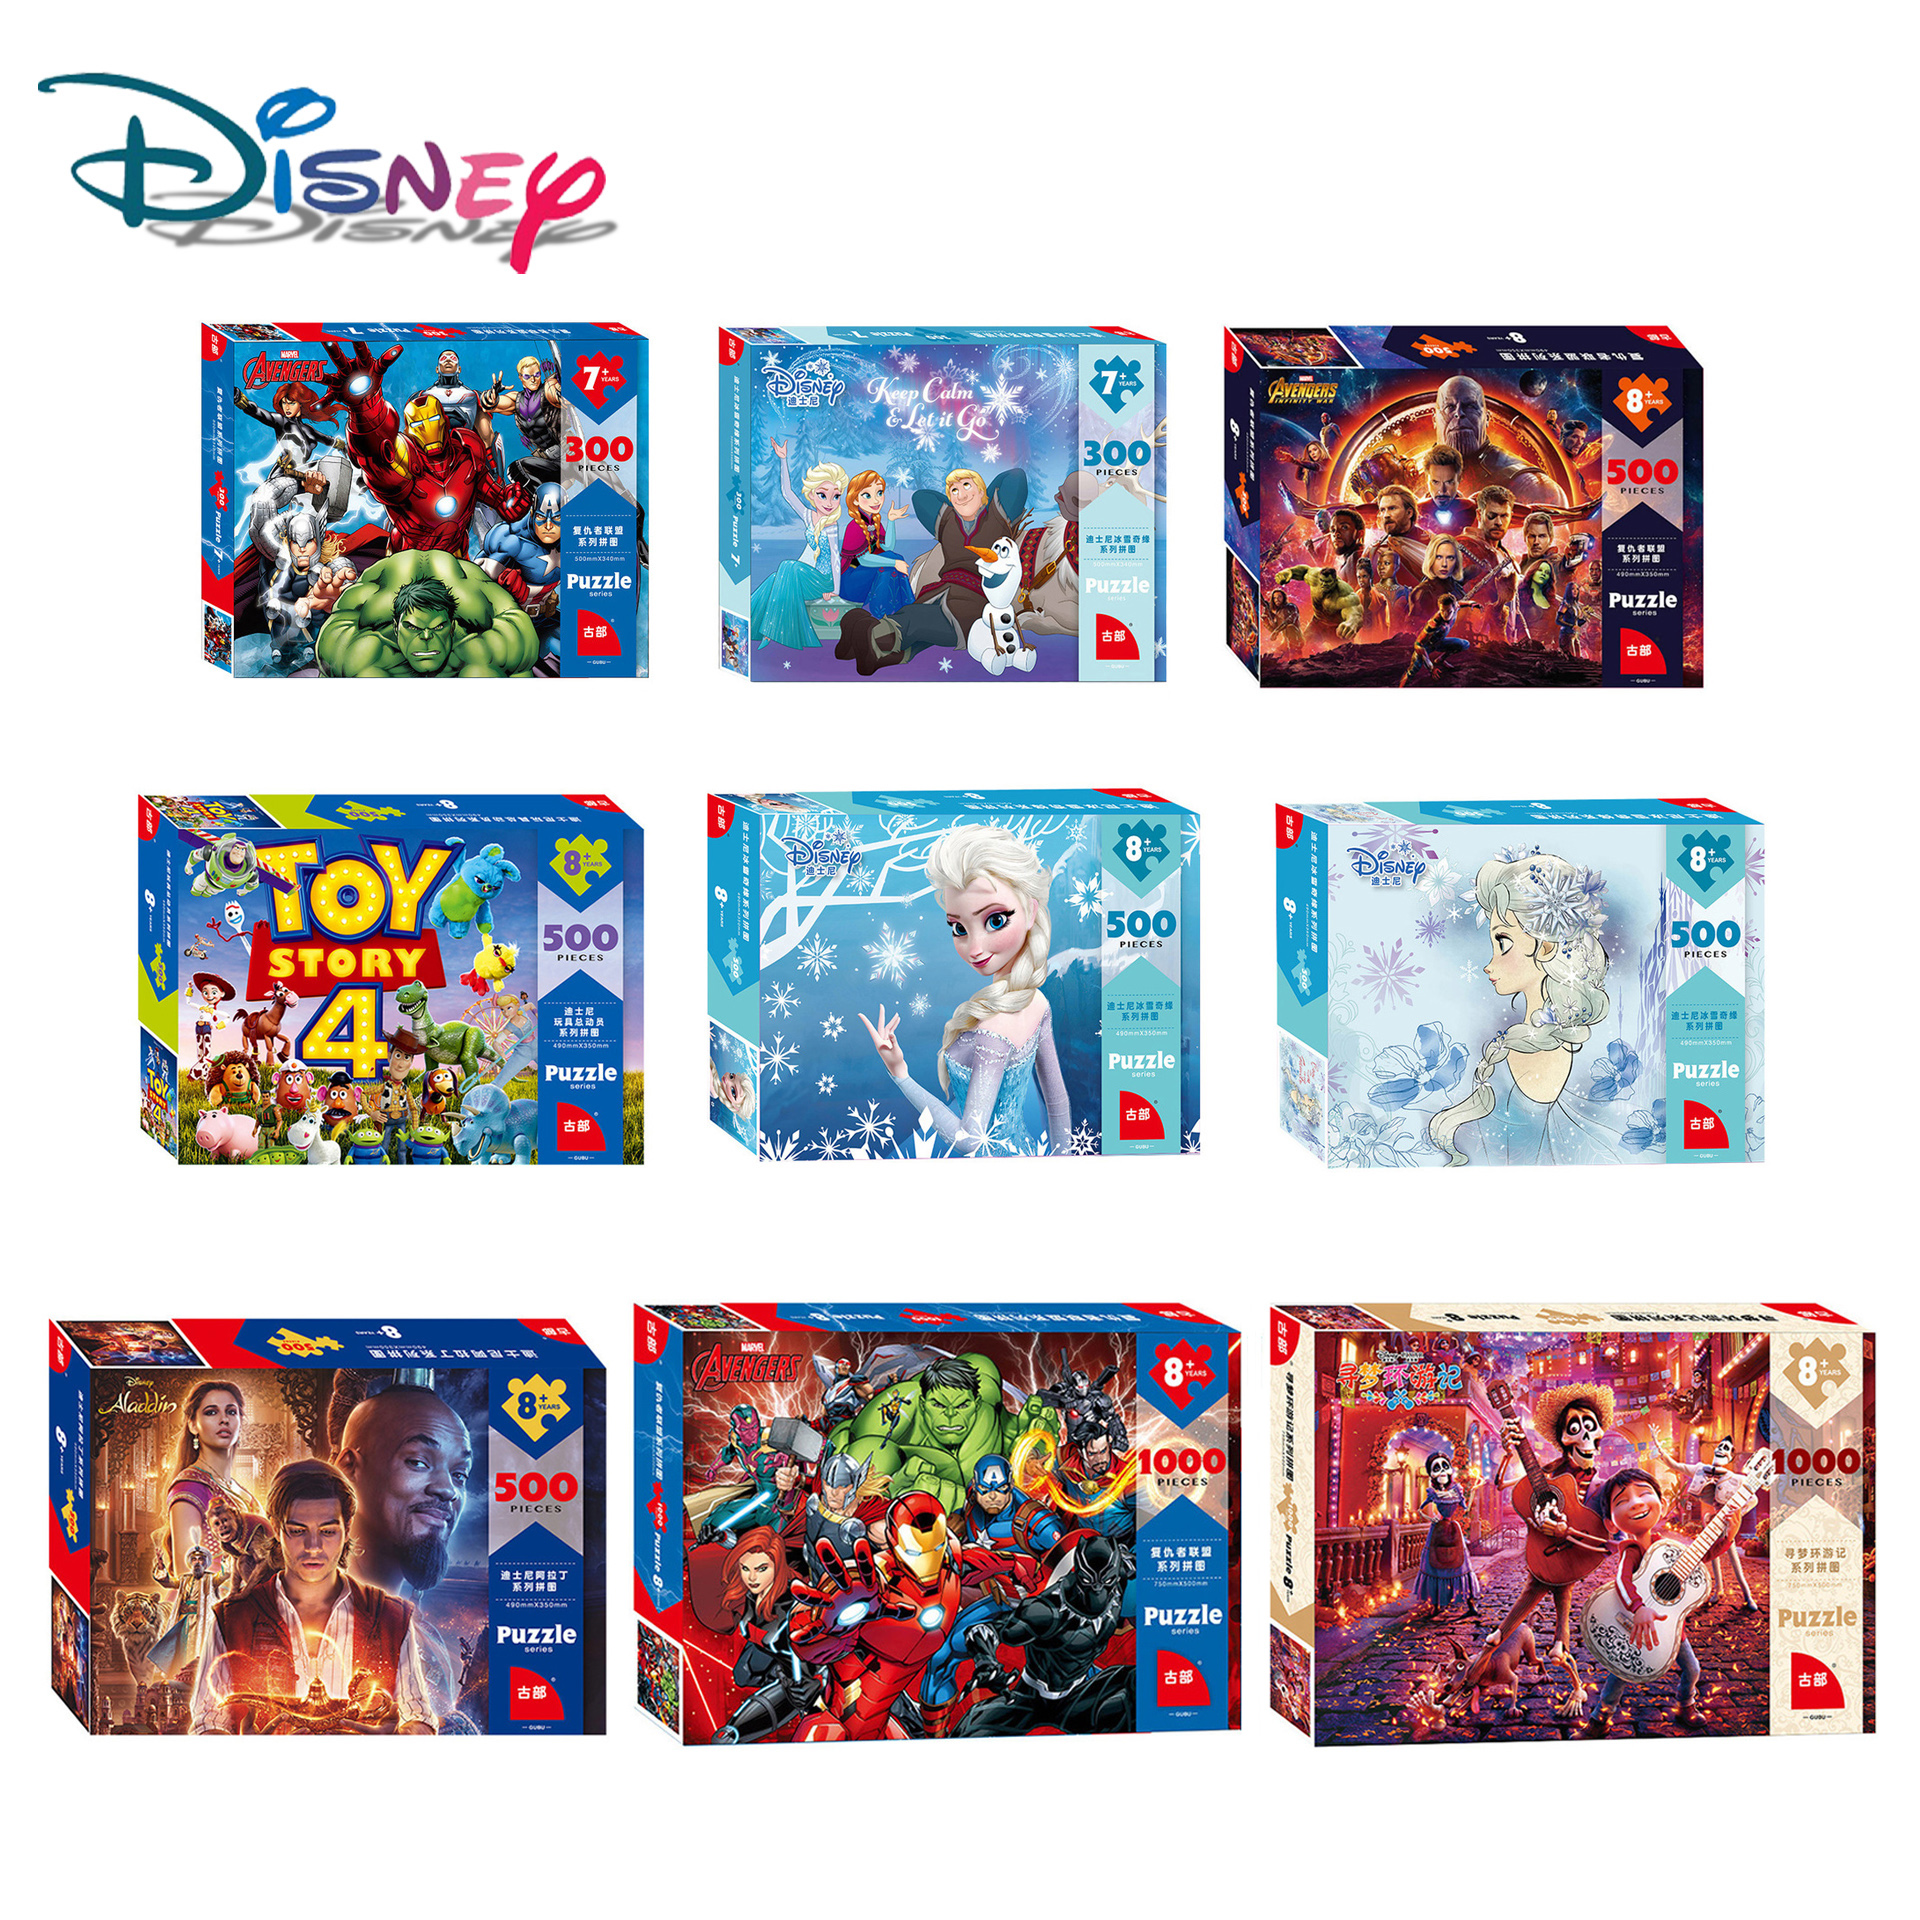 Disney 1000Pcs/500Pcs/300Pcs Toy Story Puzzle Coco Marvel Avengers Frozen 2 Puzzles Toys Aladdin And The Magic Lamp